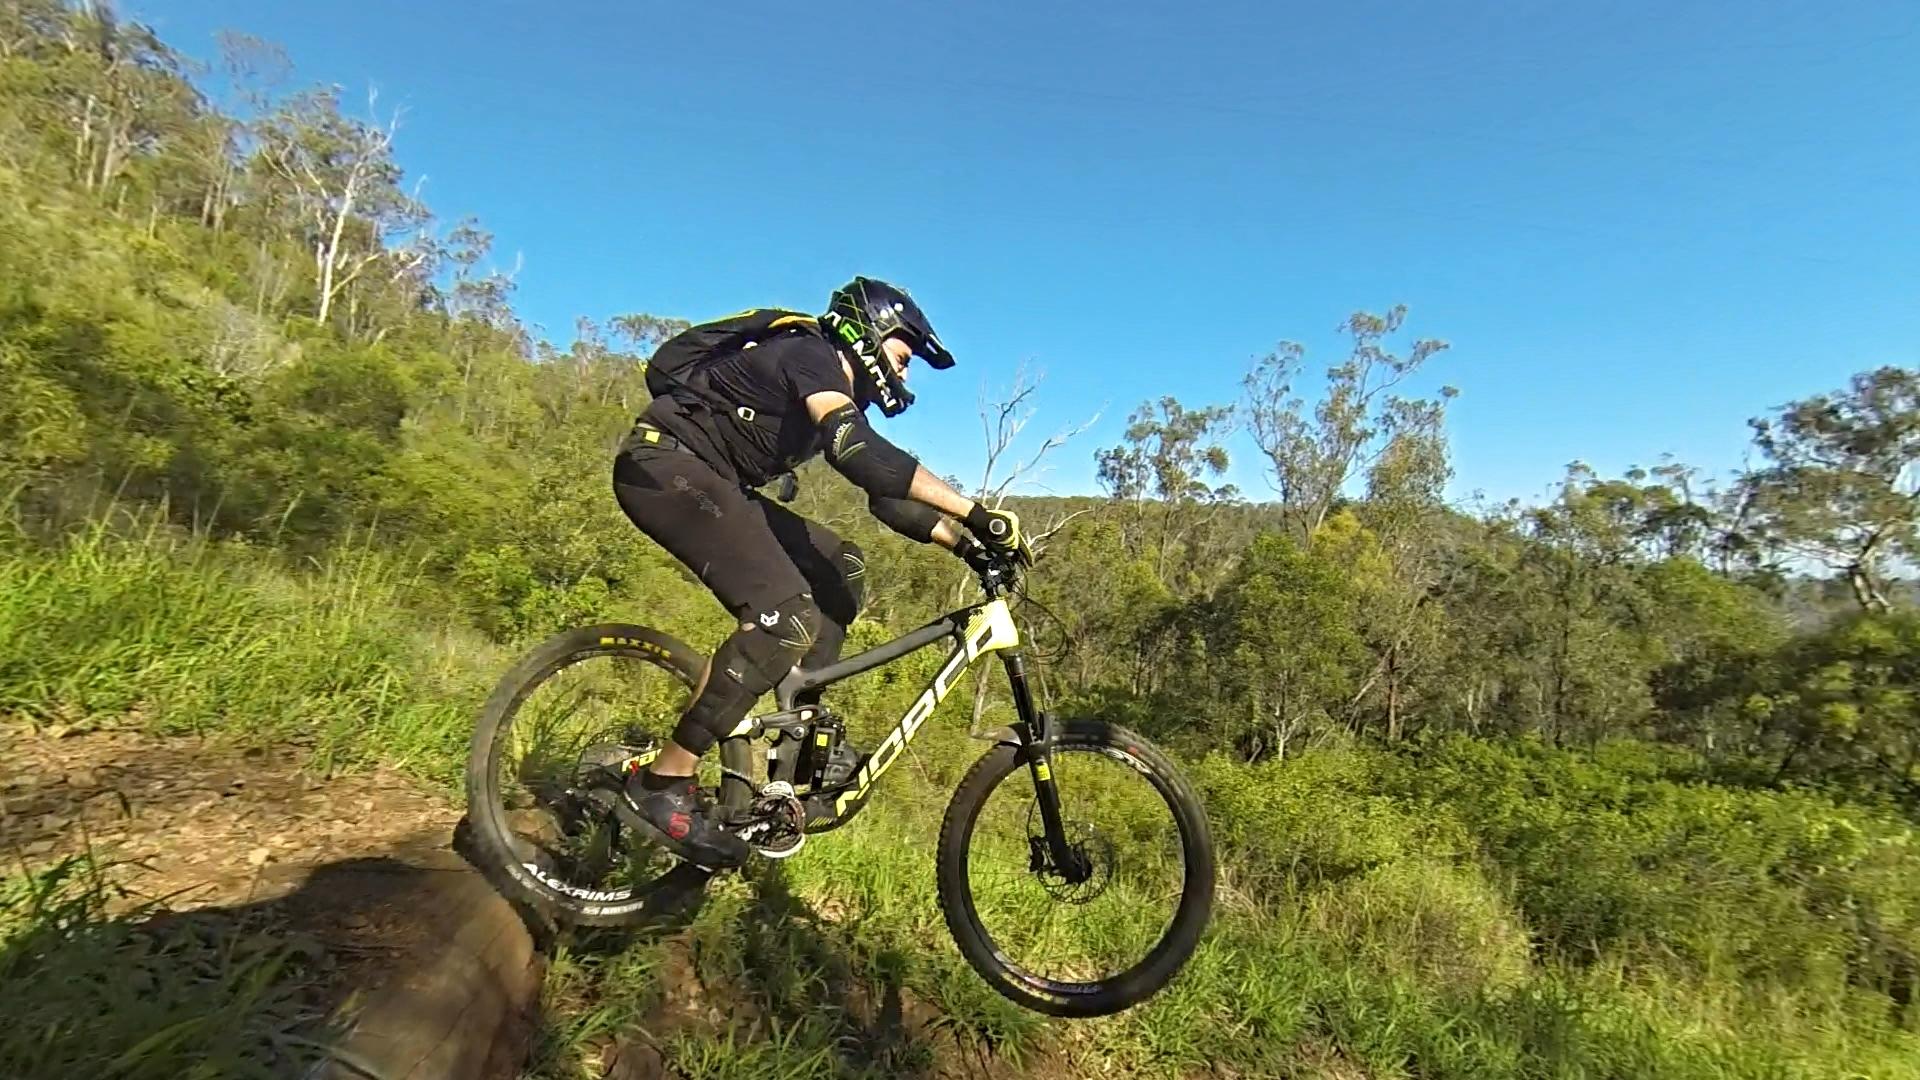 Jon Willis -  Toowoomba, Queensland, Australia - Mountain Biker